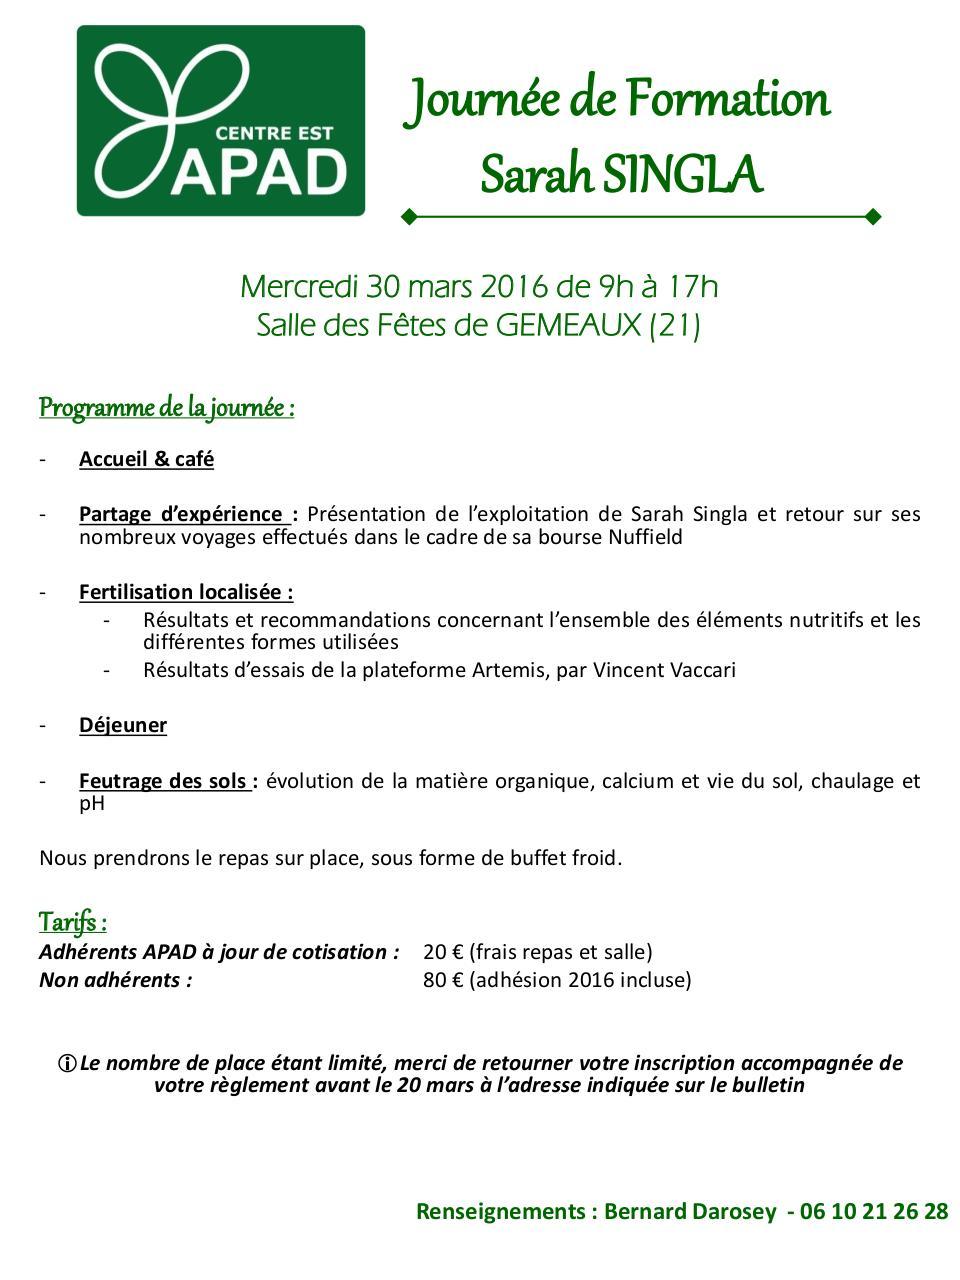 APAD centre-est : formation Sarah SINGLA 30 mars 2016 (21) Preview-formation-s-singla-30-03-2016-1